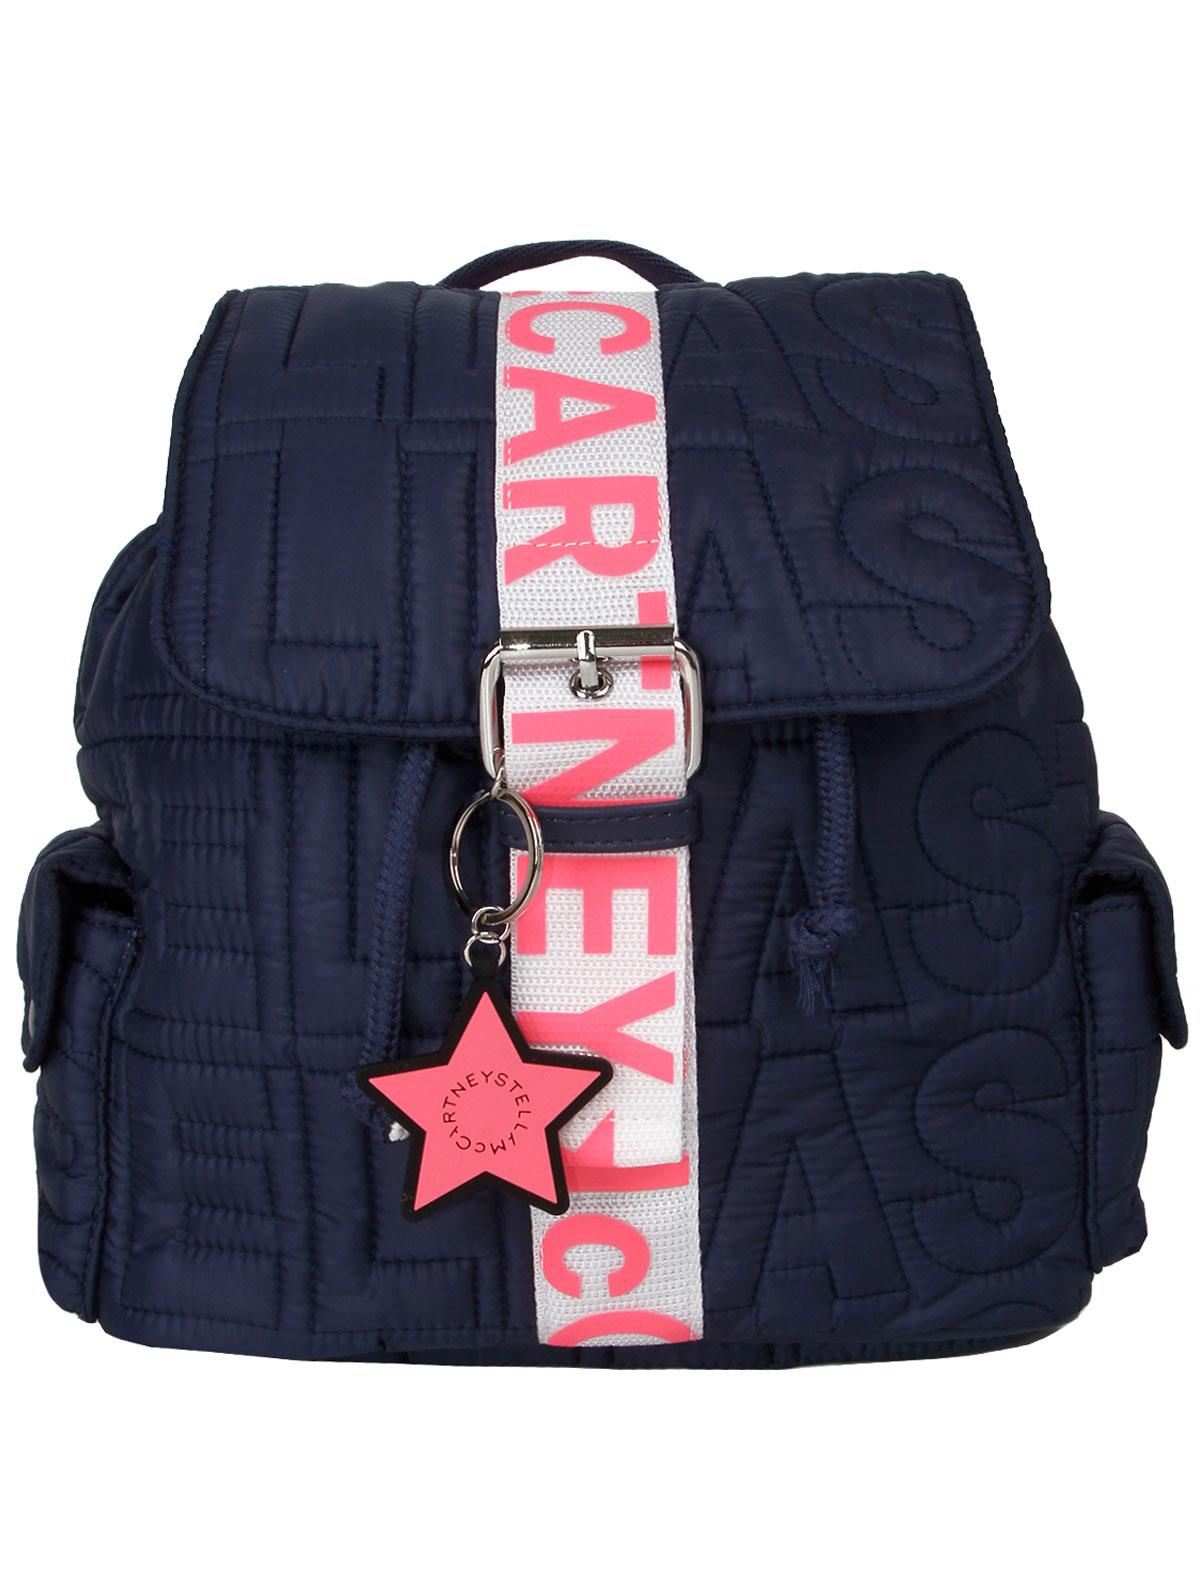 Рюкзак Stella McCartney 2280562 синего цвета